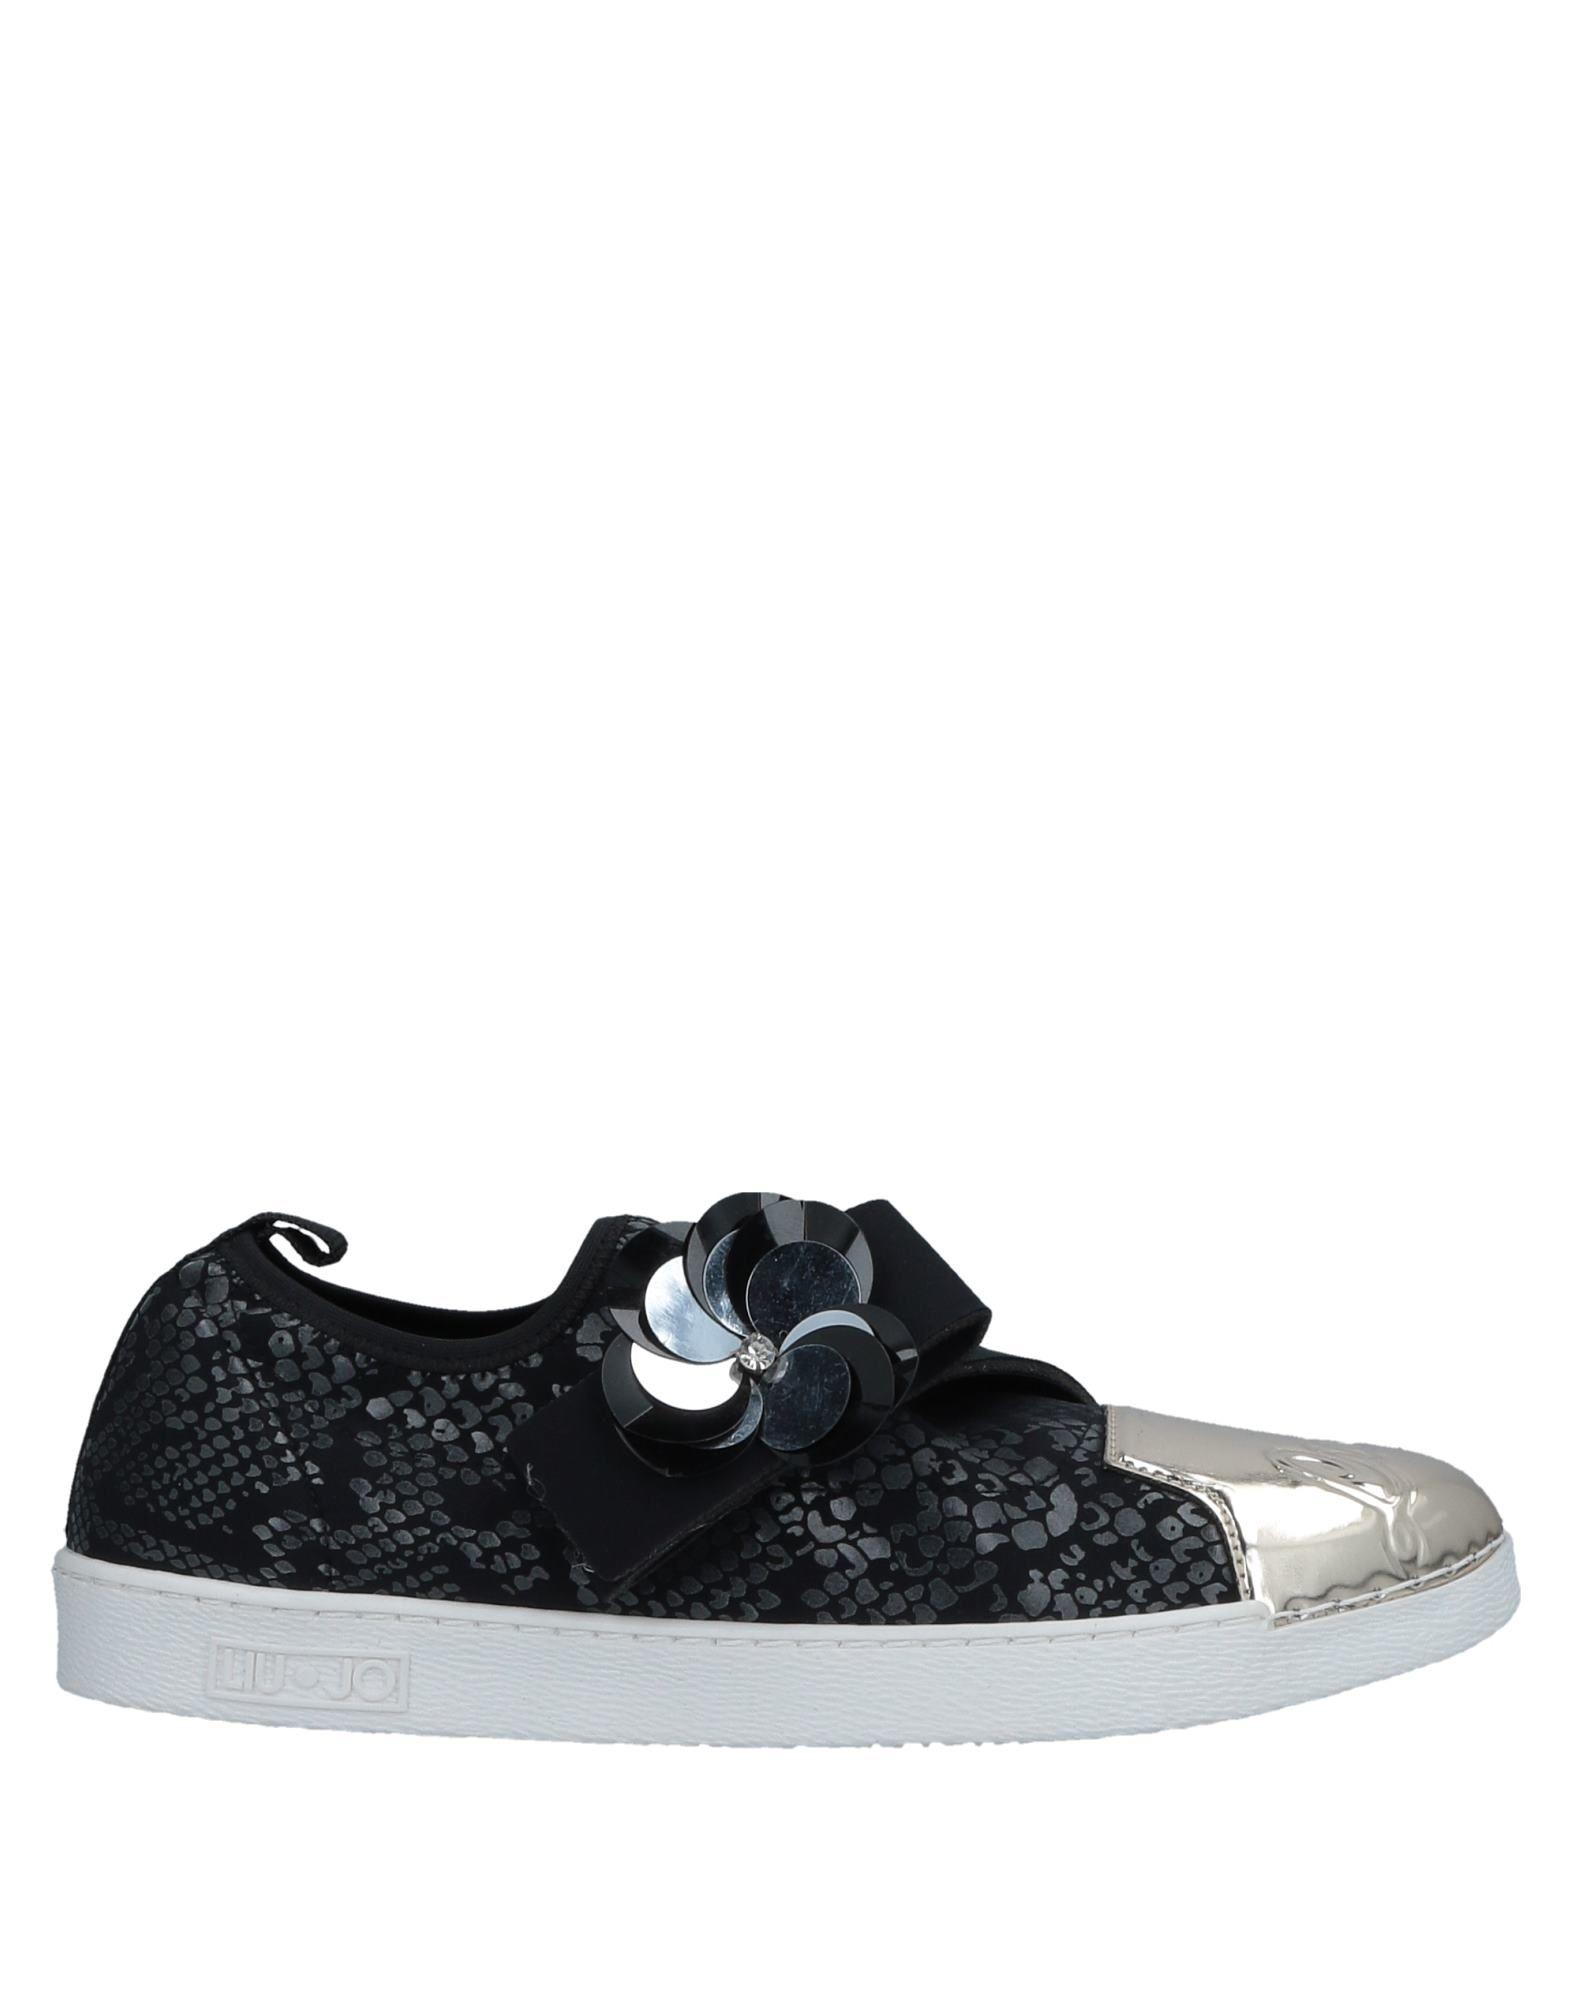 Liu •Jo Shoes Sneakers Damen  11519568EQ Gute Qualität beliebte Schuhe